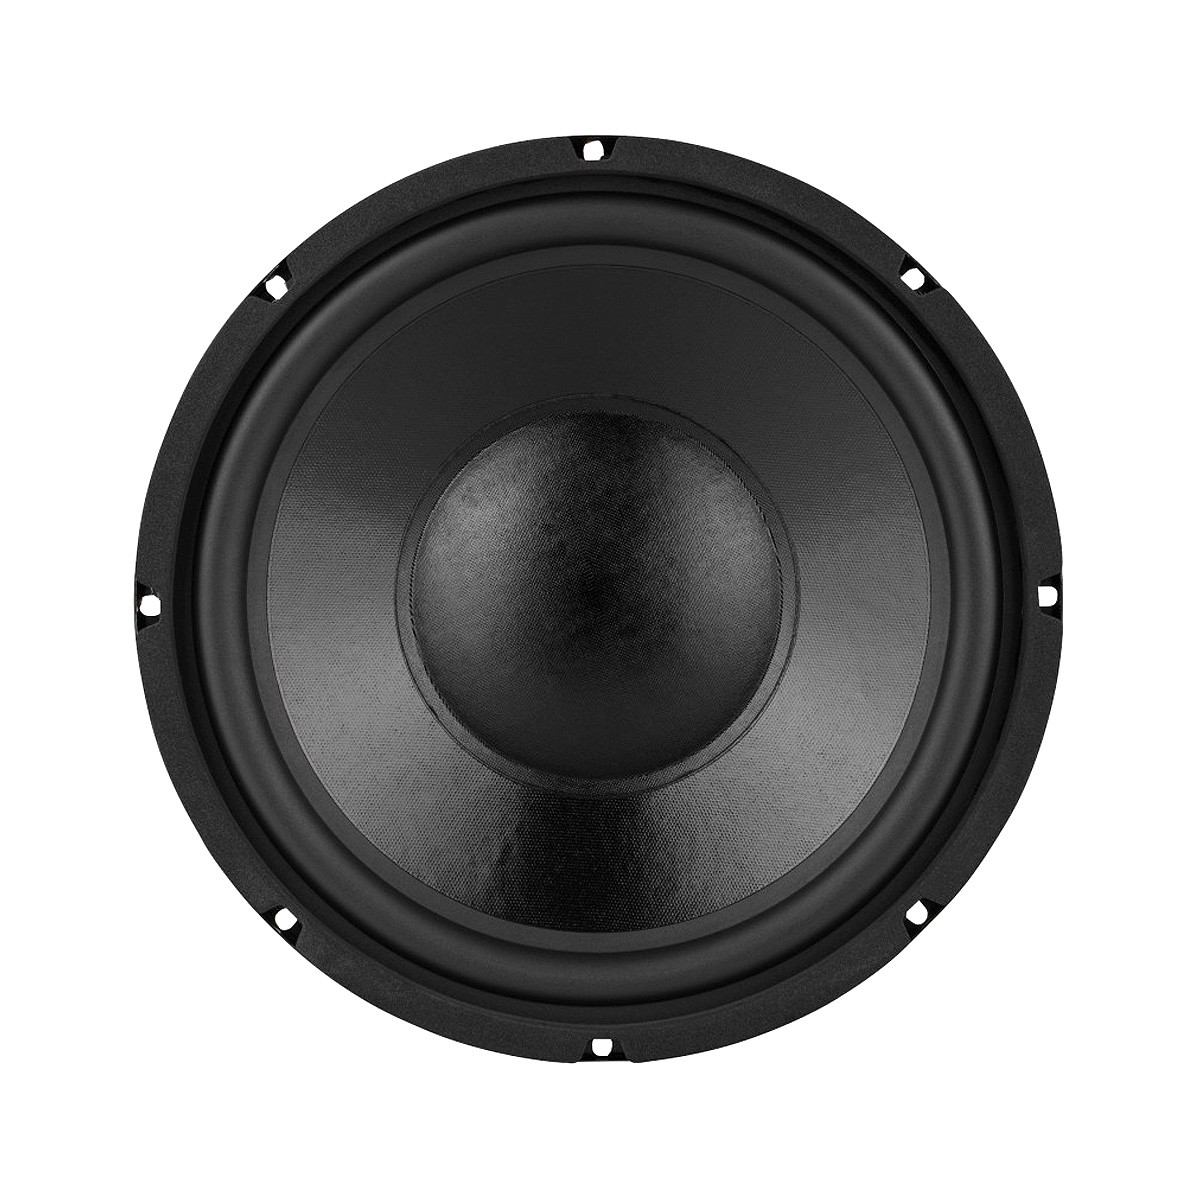 DAYTON AUDIO DCS305-4 Subwoofer Speaker 4 Ohm Ø30.5cm (Unit)